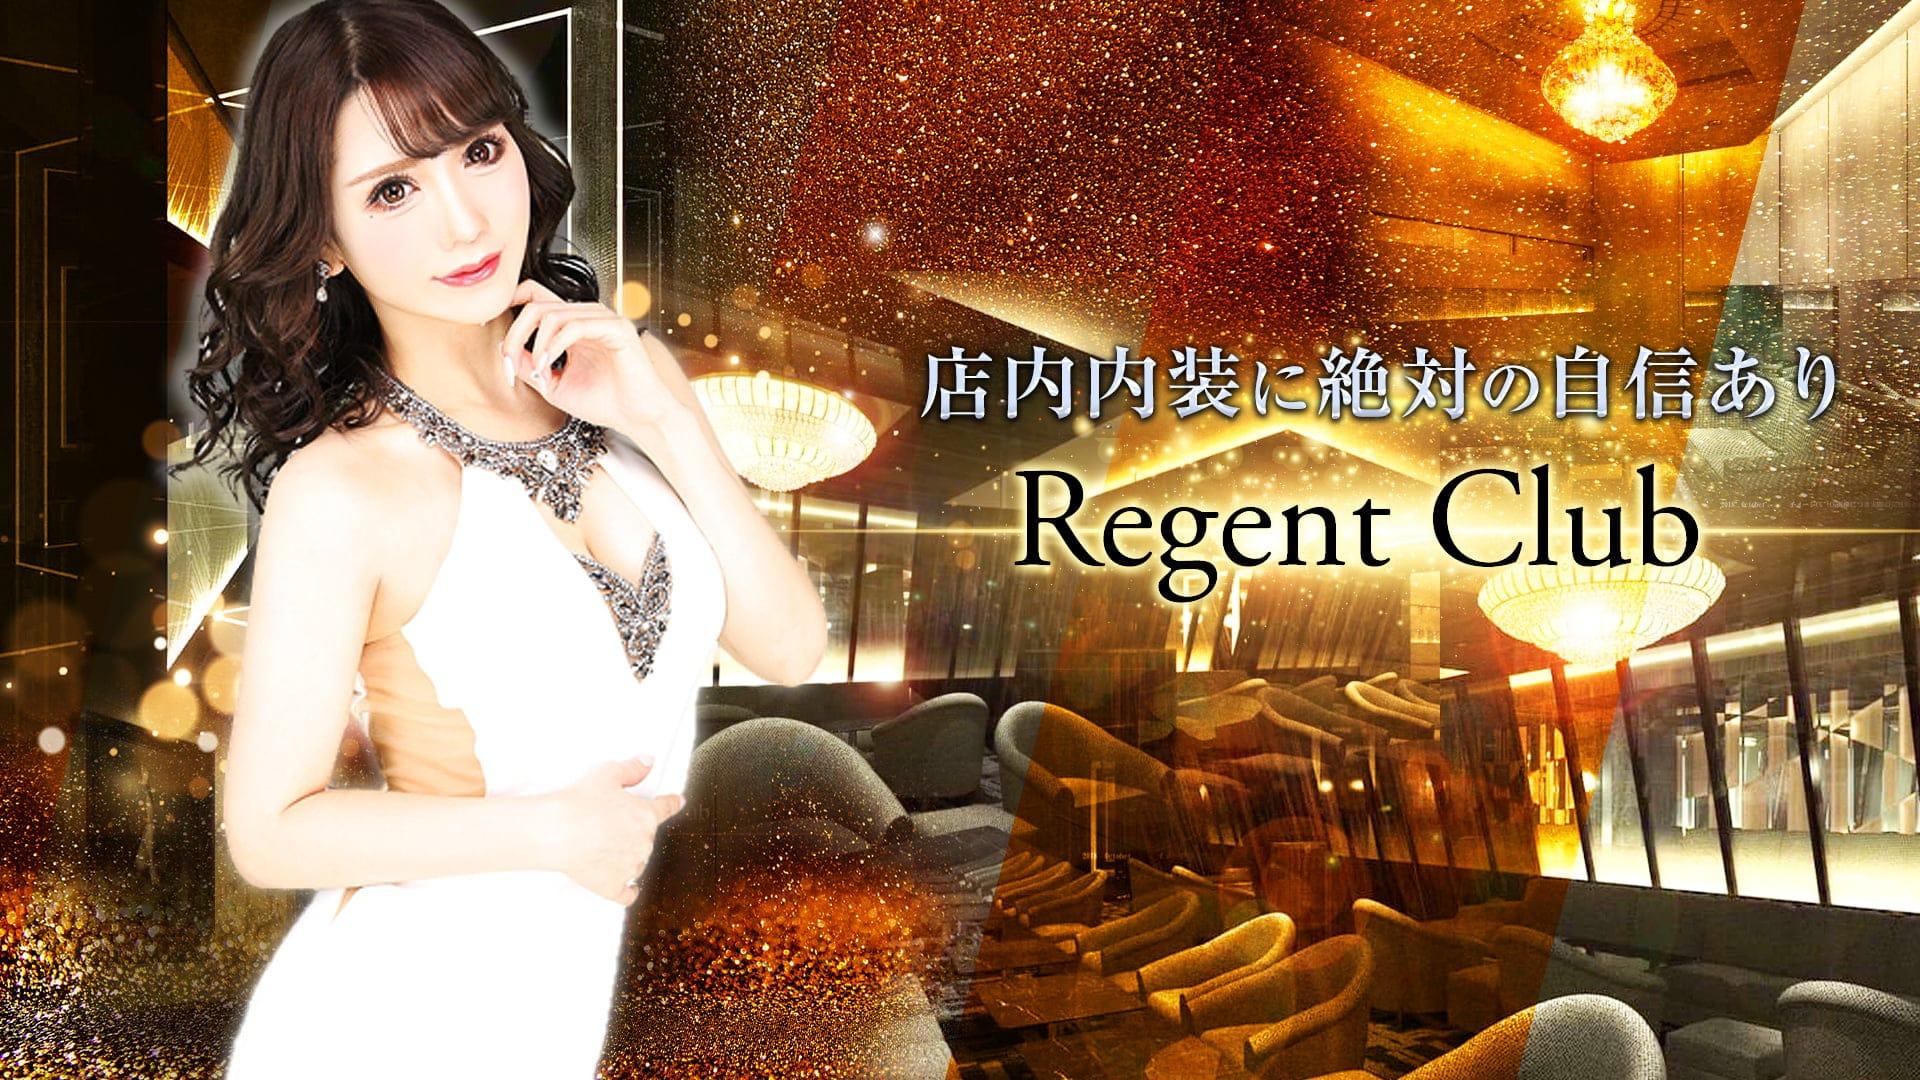 REGENT CLUB横浜(リージェントクラブ)【公式求人・体入情報】 横浜キャバクラ TOP画像